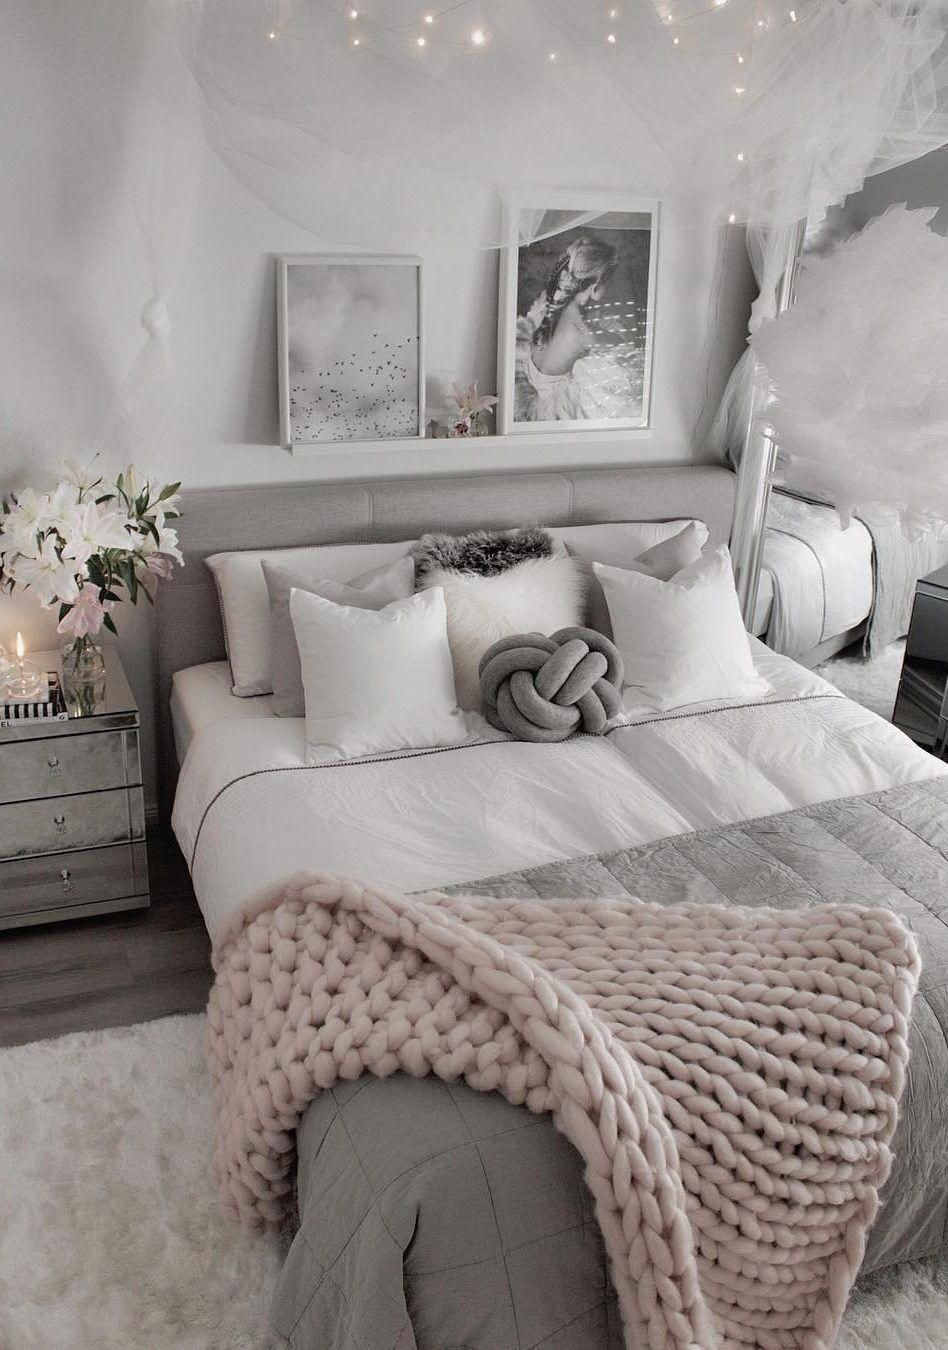 Master Suite Rug Bedroom Ikea Cosy Master Bedroom Ideas Bedroom Stylings S Master Sui Room Ideas Bedroom Room Decor Bedroom Amazing Bedroom Designs